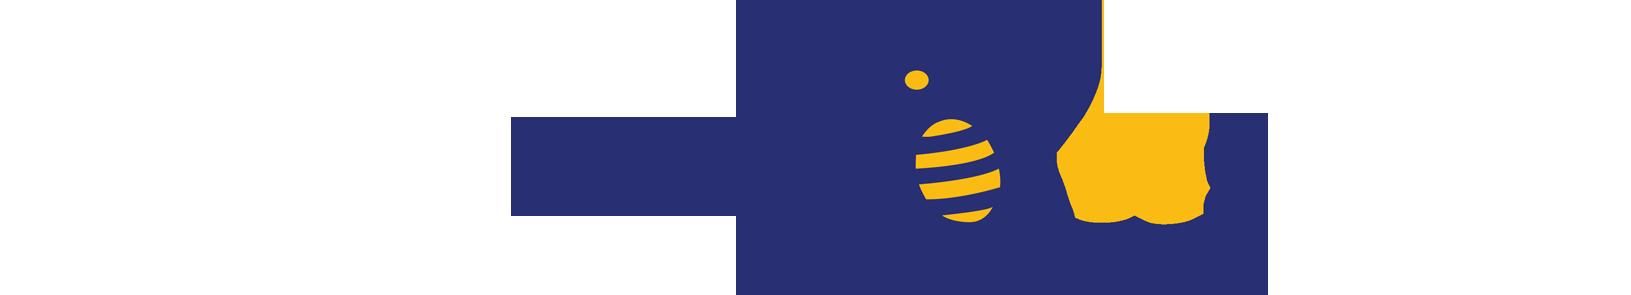 Porterbees - Online Super Market